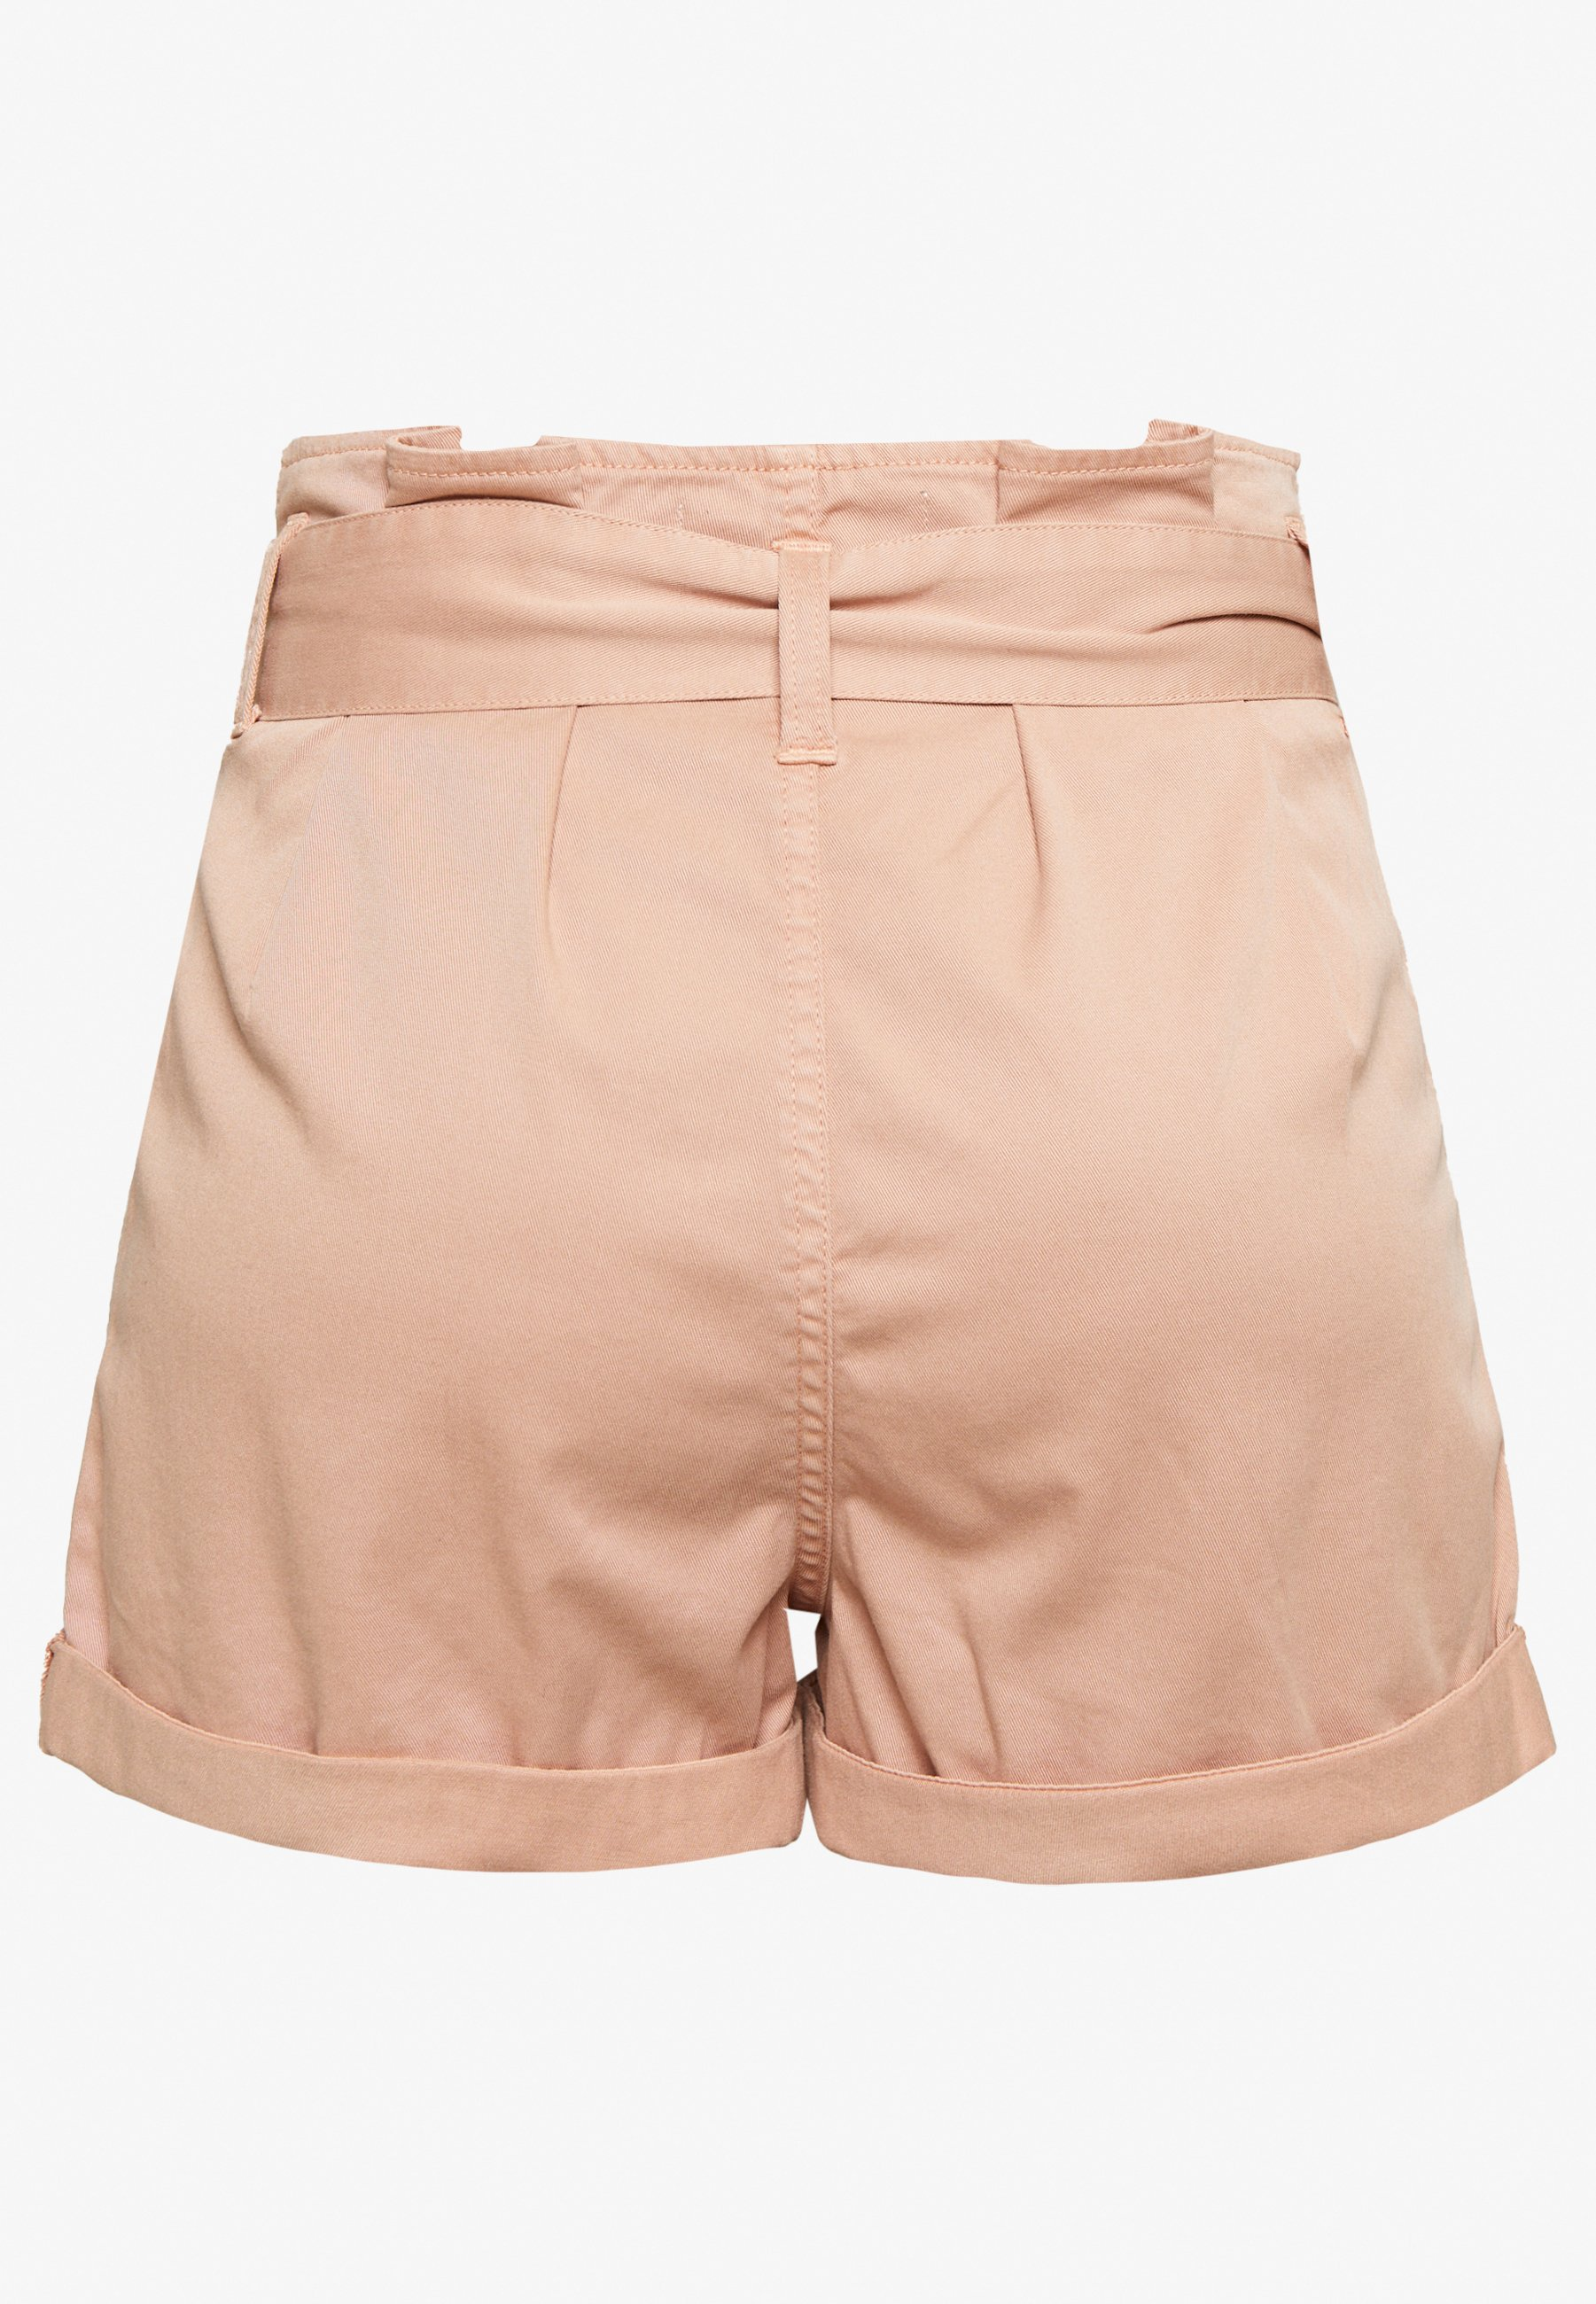 Miss Selfridge Hang Tab Belted - Shorts Light Pink